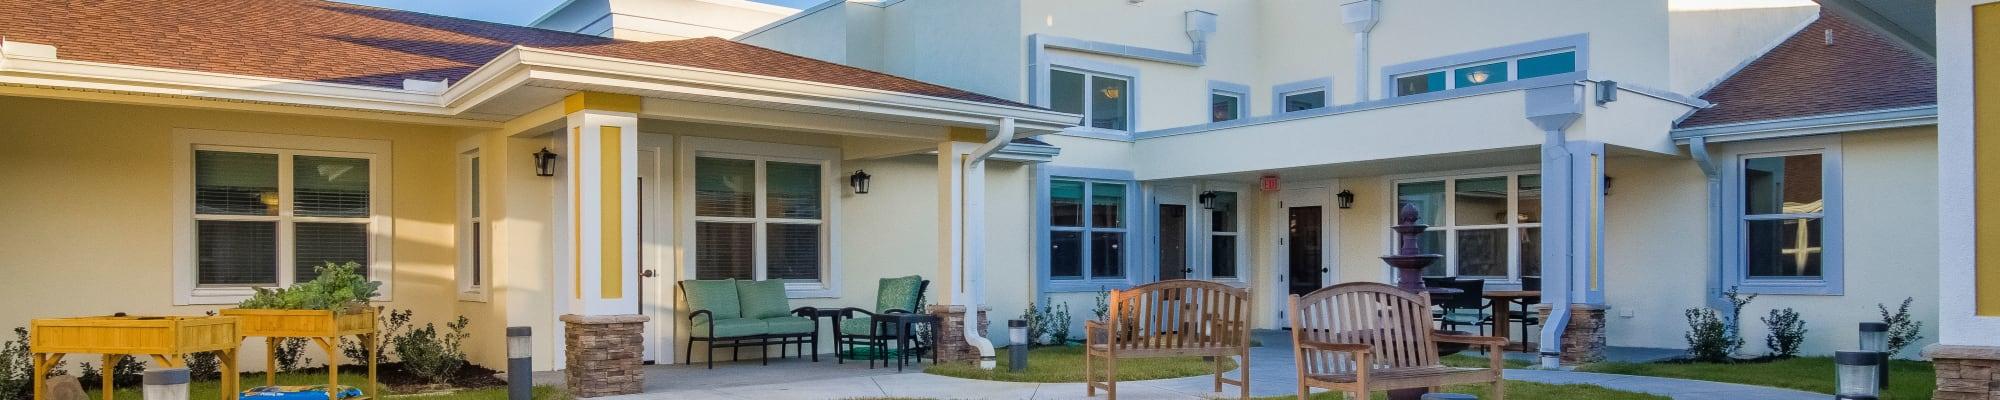 Our Community at CERTUS Premier Memory Care Living in Orange City, Florida.